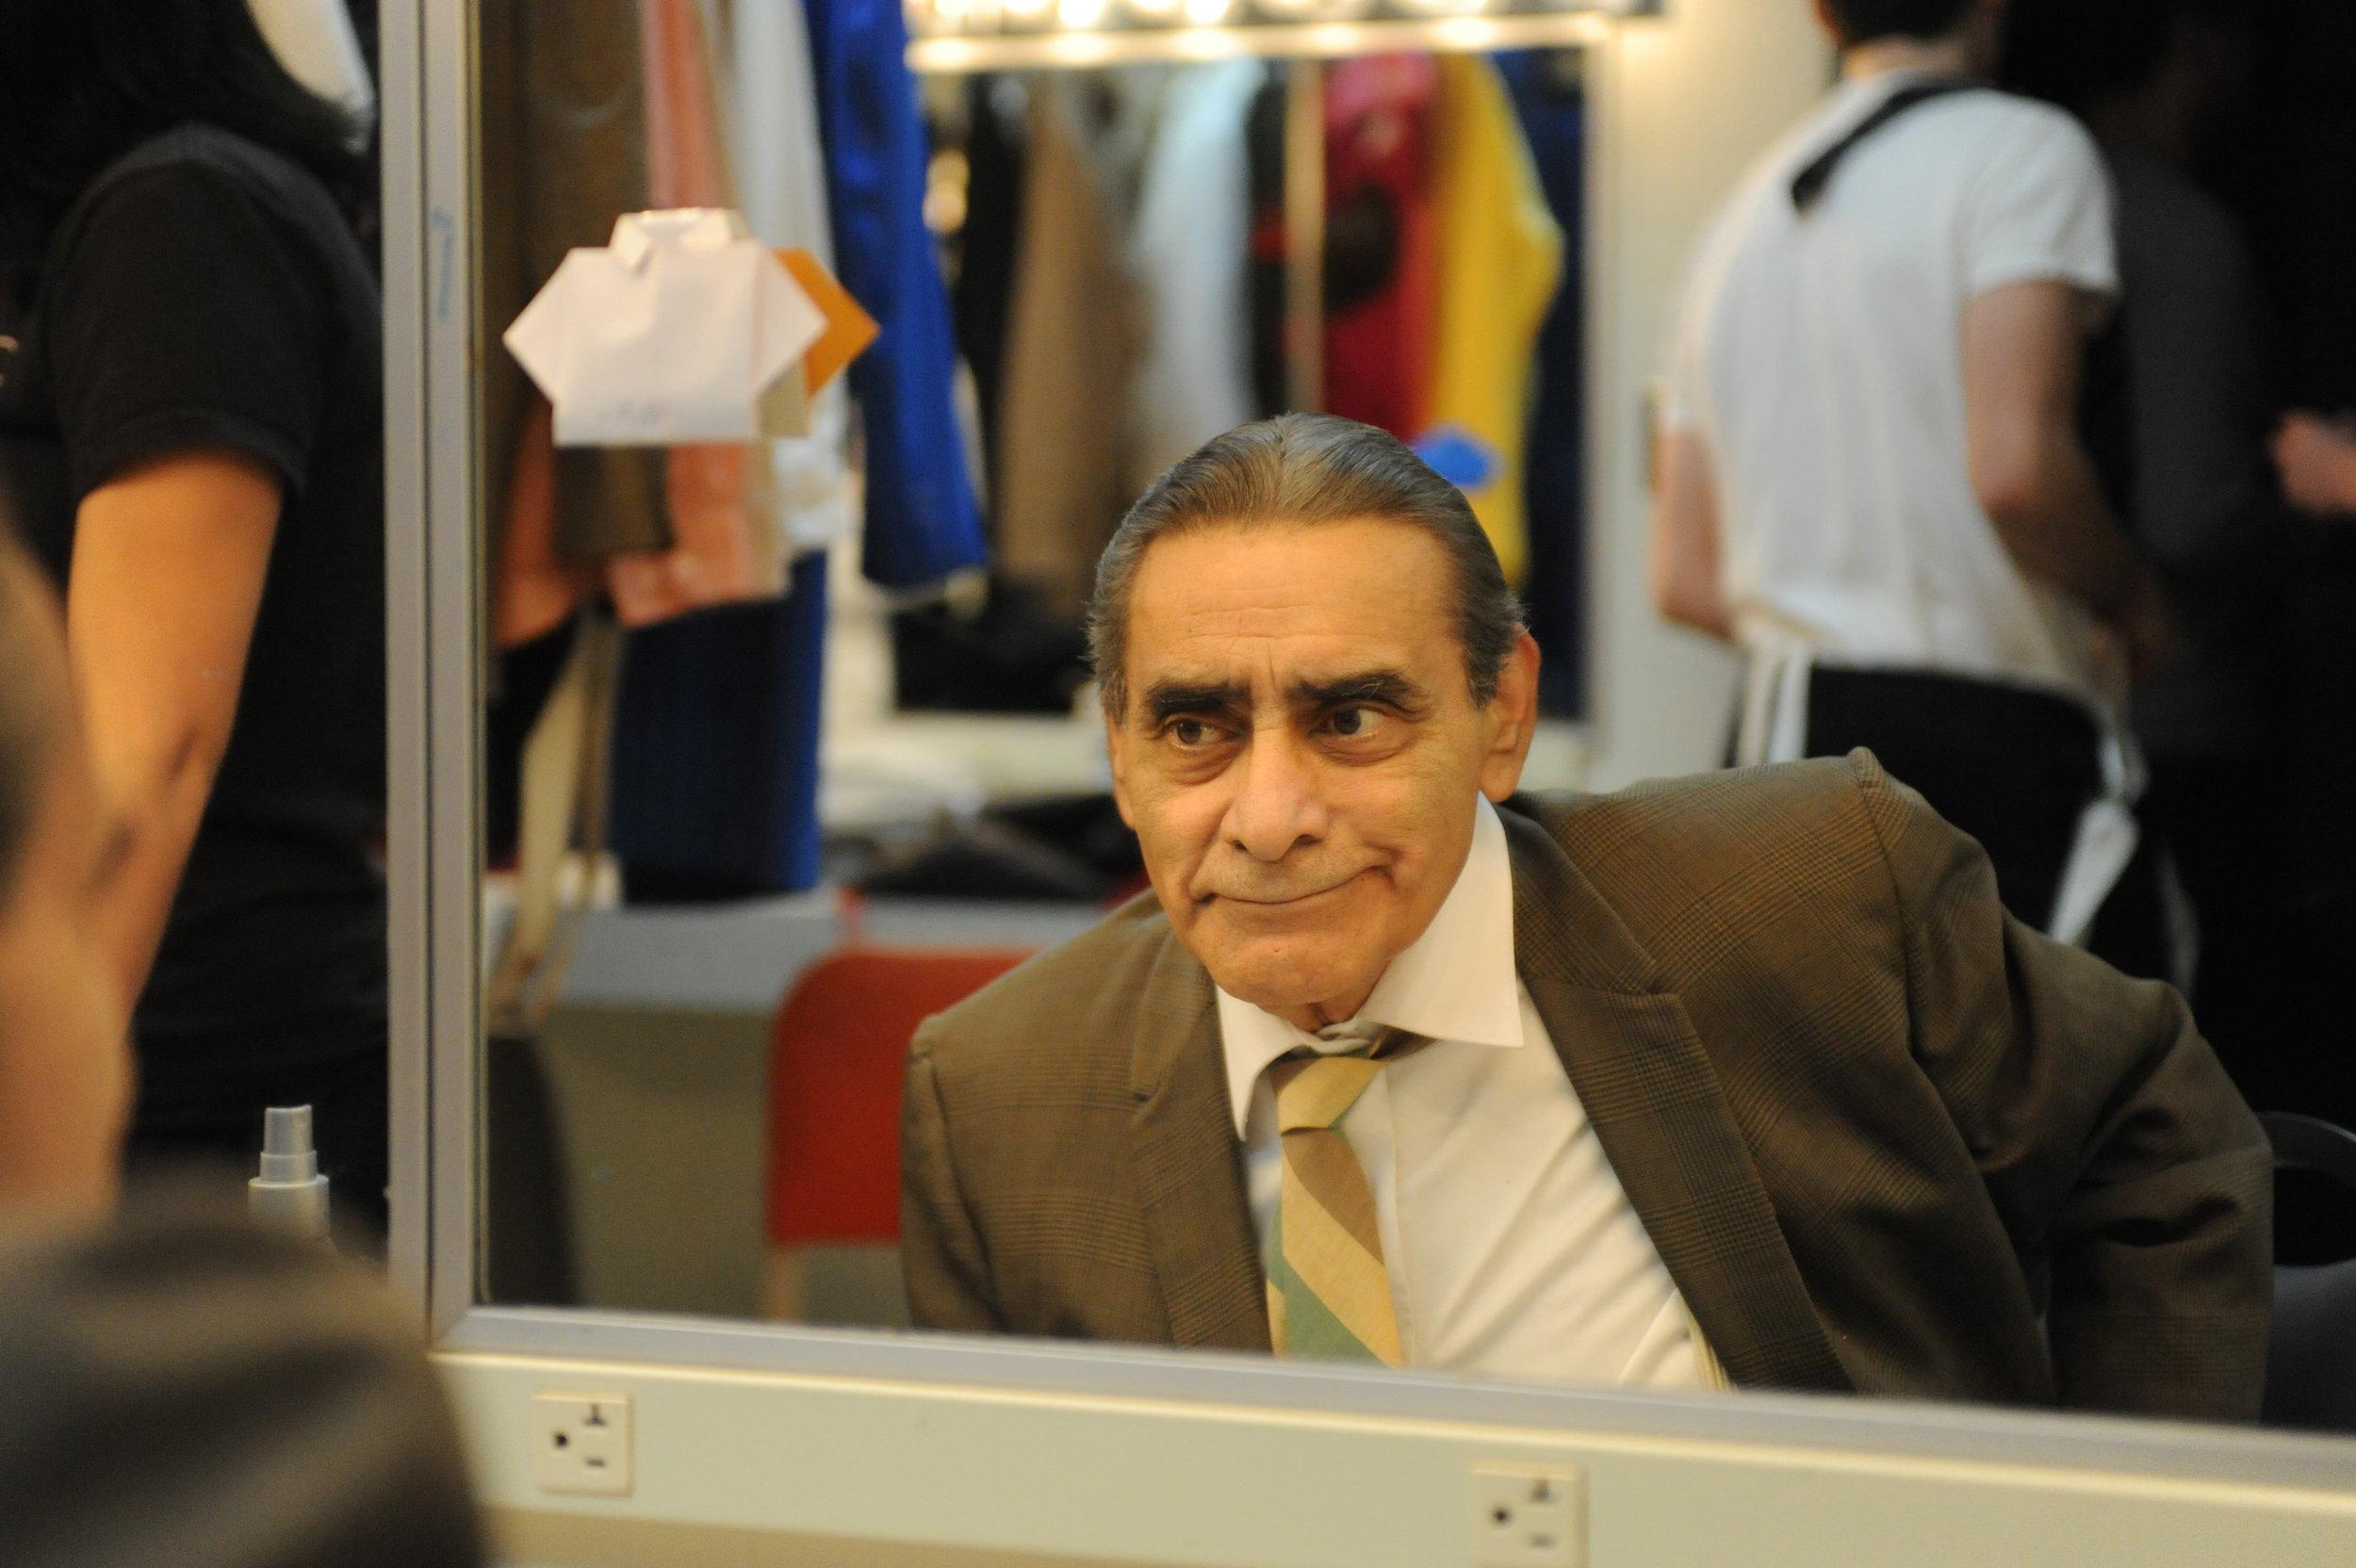 BEHIND THE SCENES! - Actor Antonio Juarez getting into hair and makeup